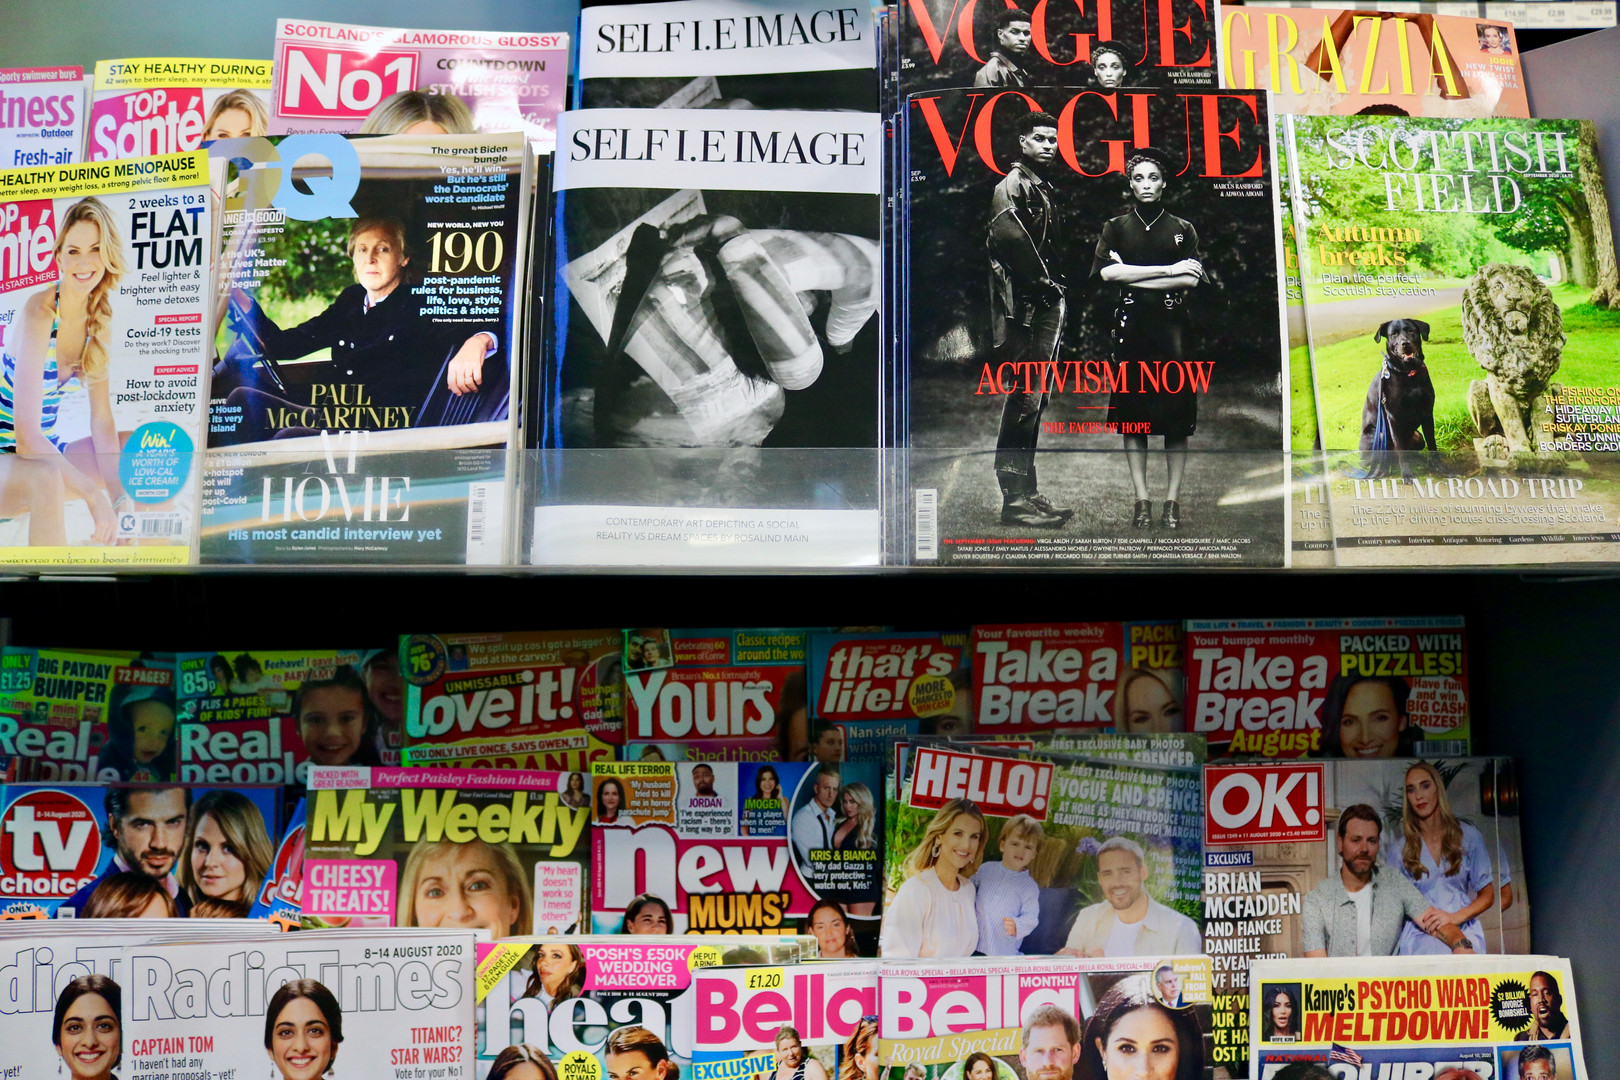 SELF I.E IMAGE magazine on display